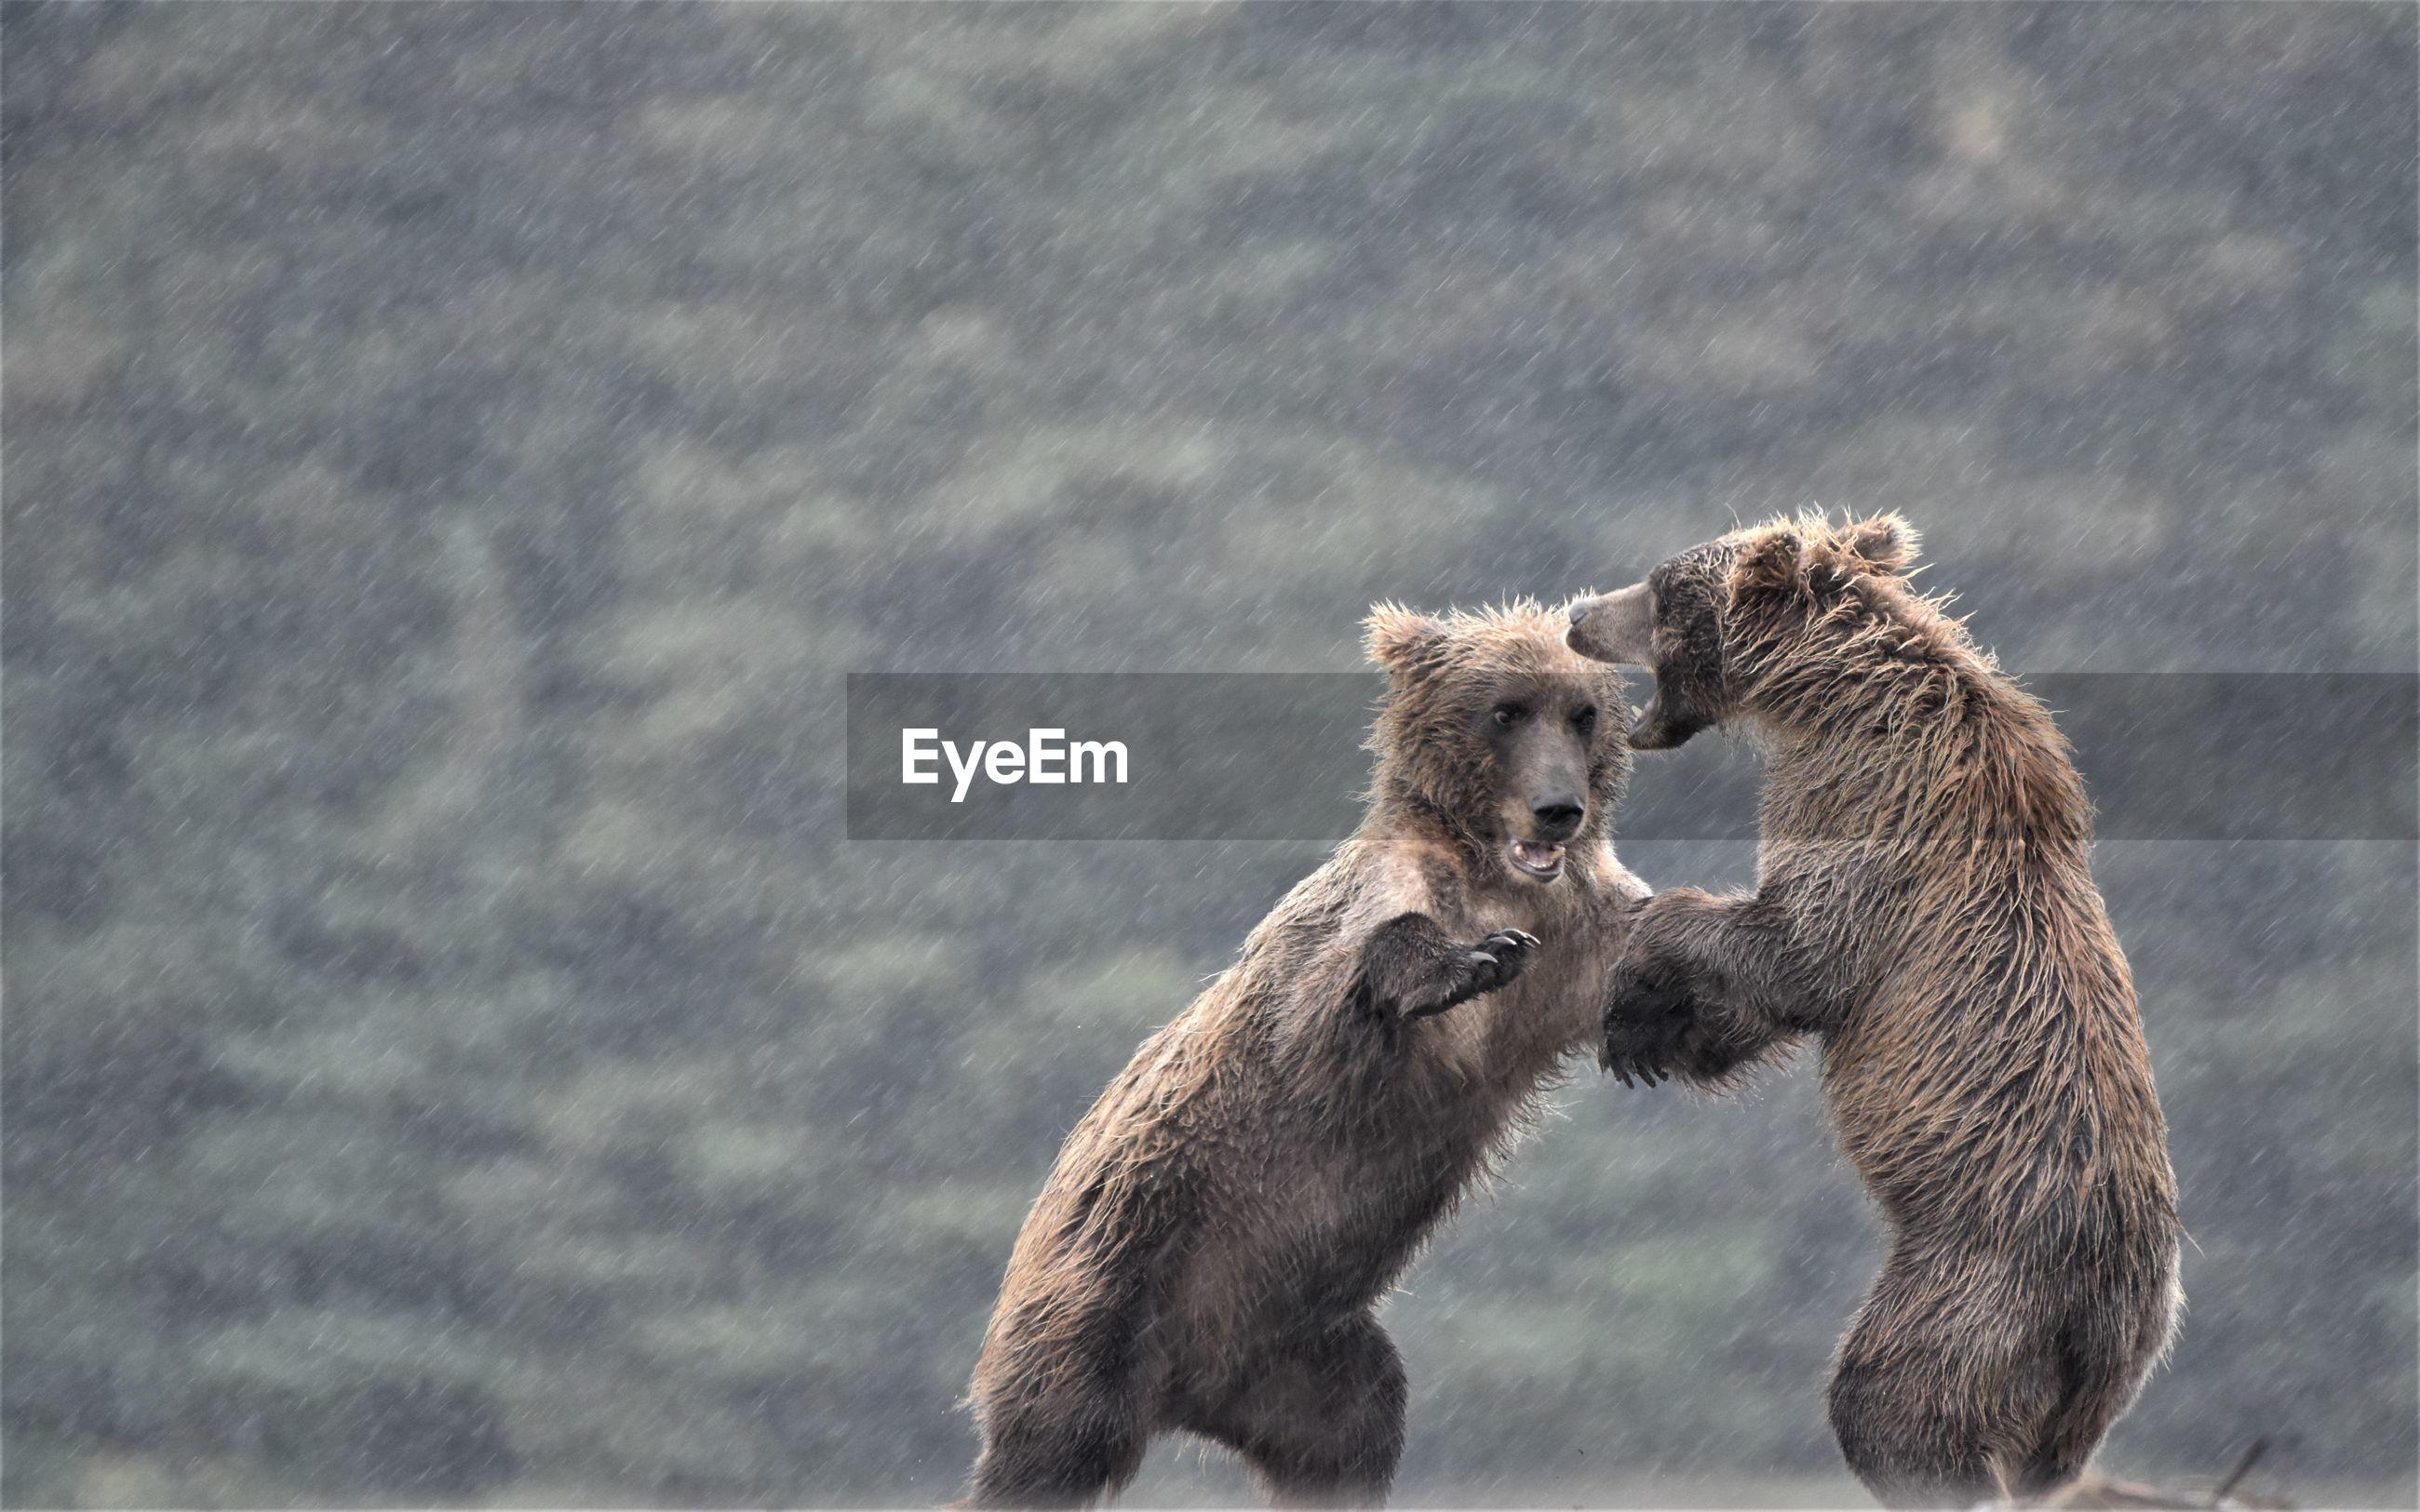 Brown bears fighting during rainfall